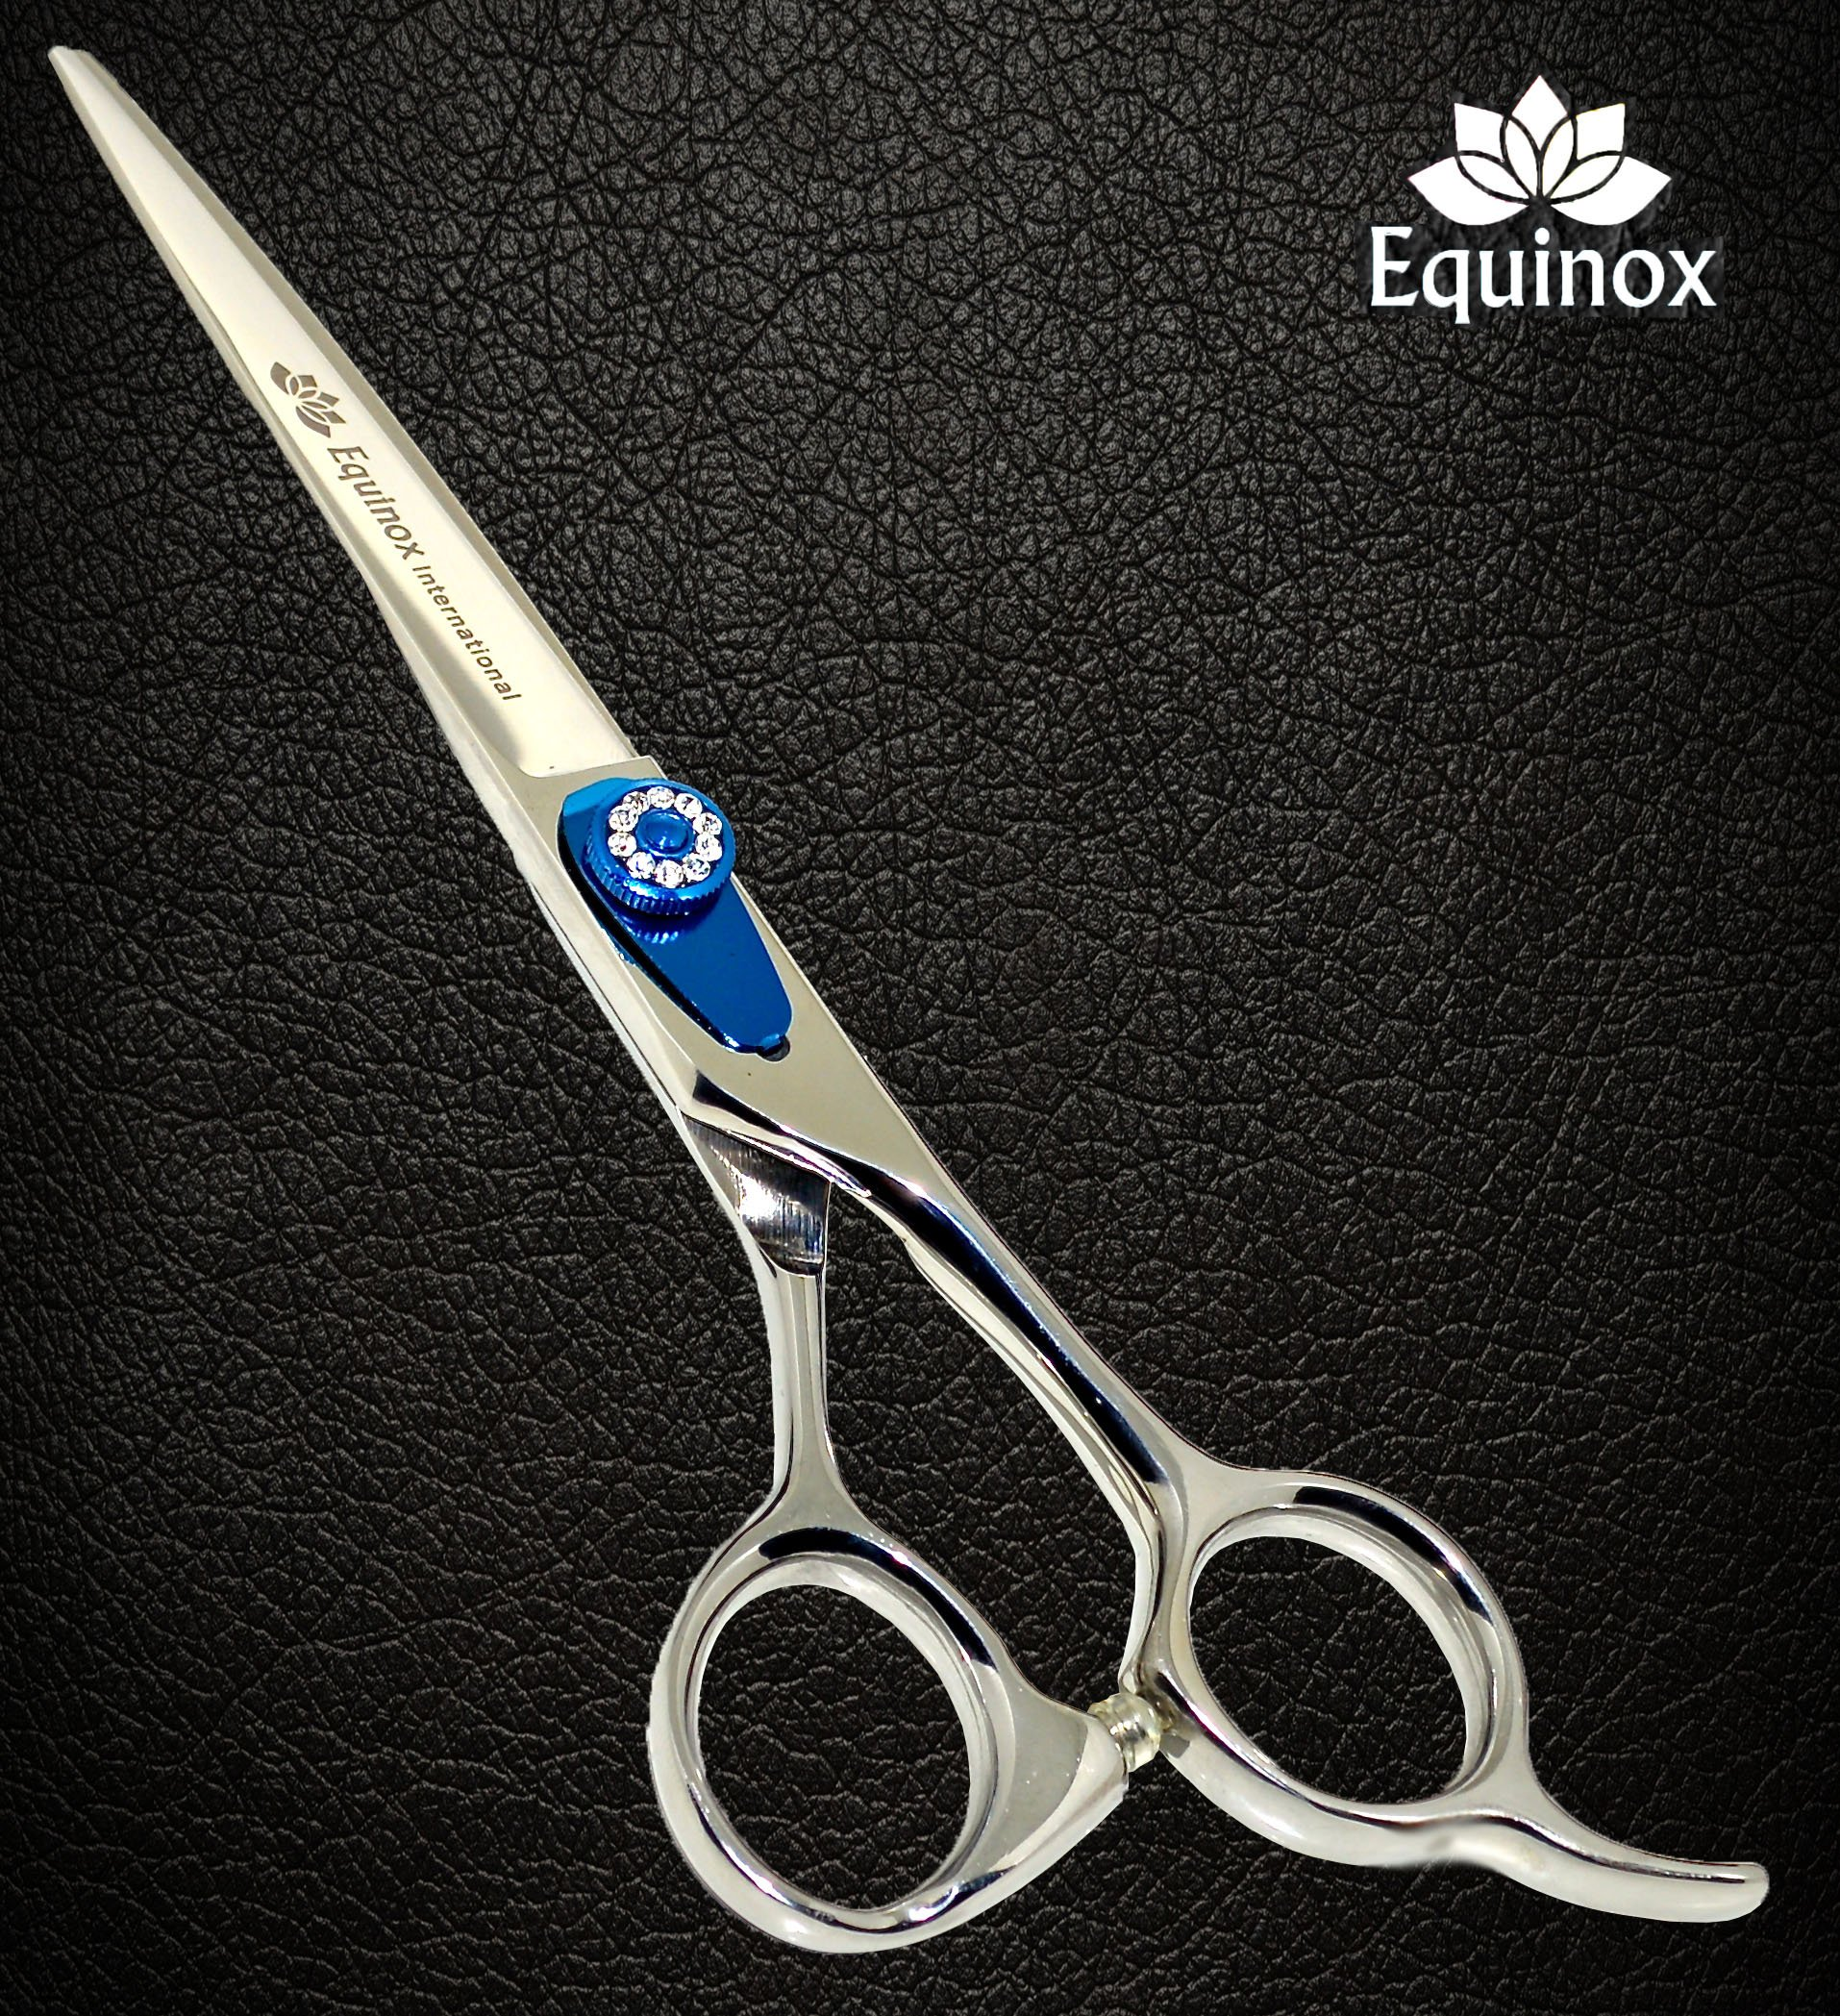 Equinox Professional Razor Edge Series - Barber Hair Cutting Scissors/Shears - 6.5'' Overall Length - Beautiful White Diamond Stones with Blue Chromium Fine Adjustment Tension Screw by Equinox International (Image #2)